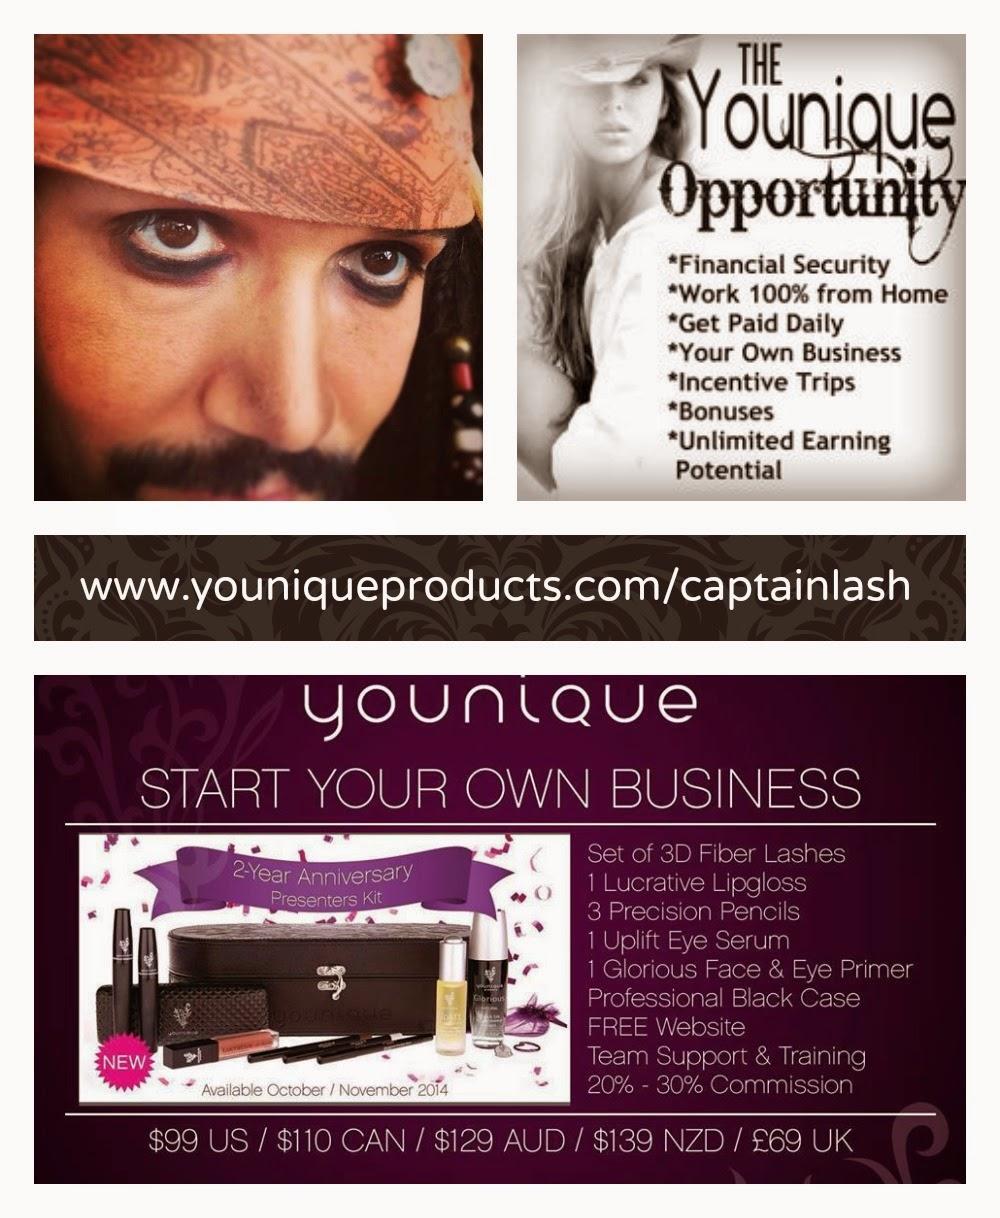 https://www.youniqueproducts.com/captainlash/business